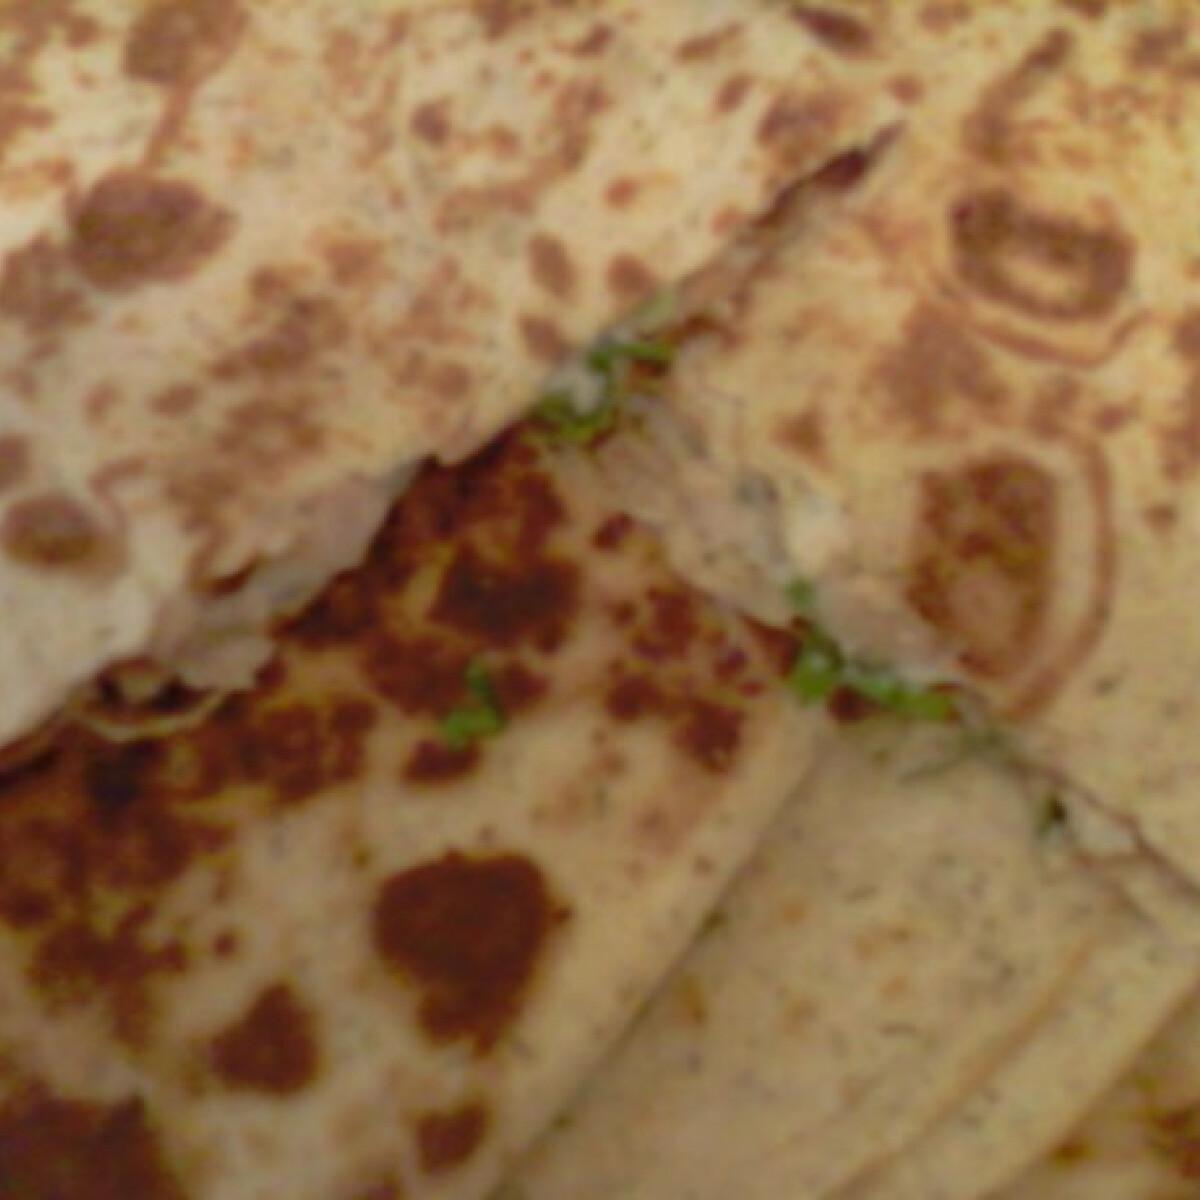 Snidlinges mediterrán quesadilla